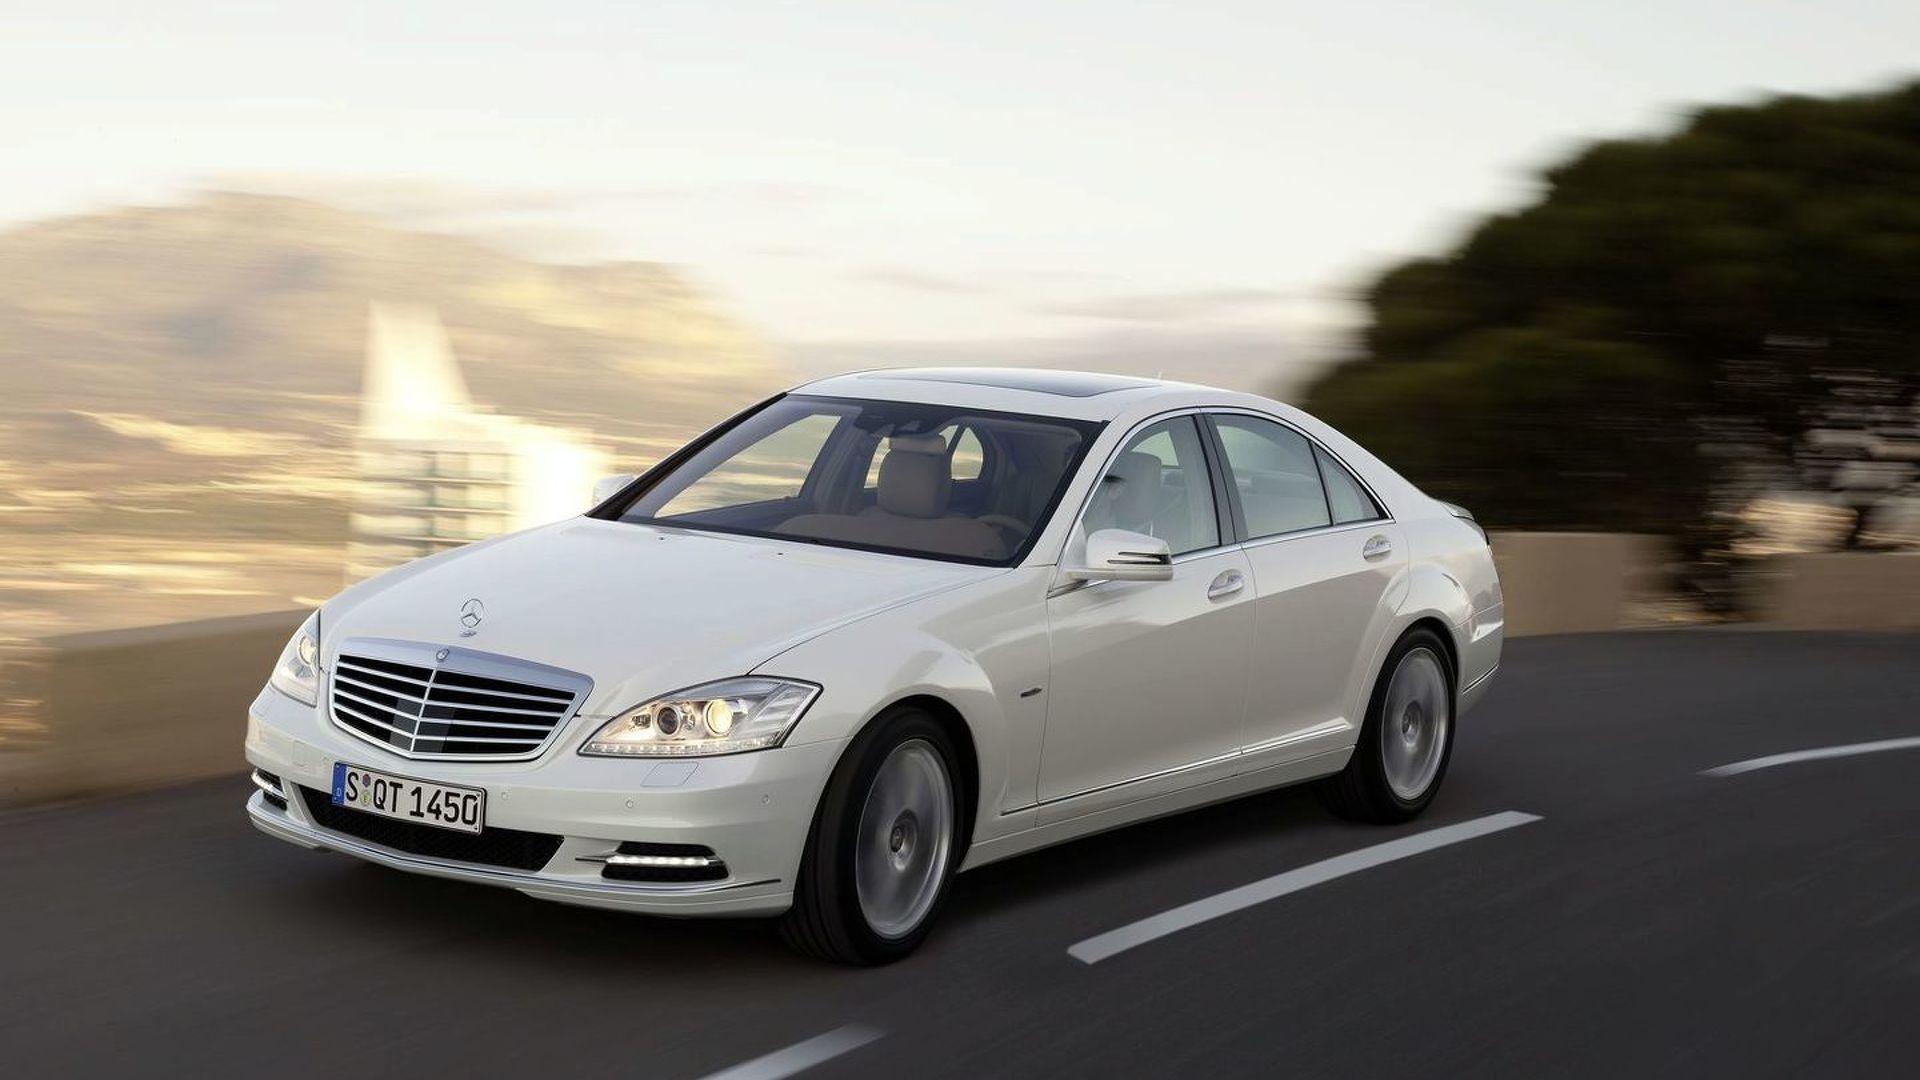 Mercedes-Benz S 400 Hybrid further details